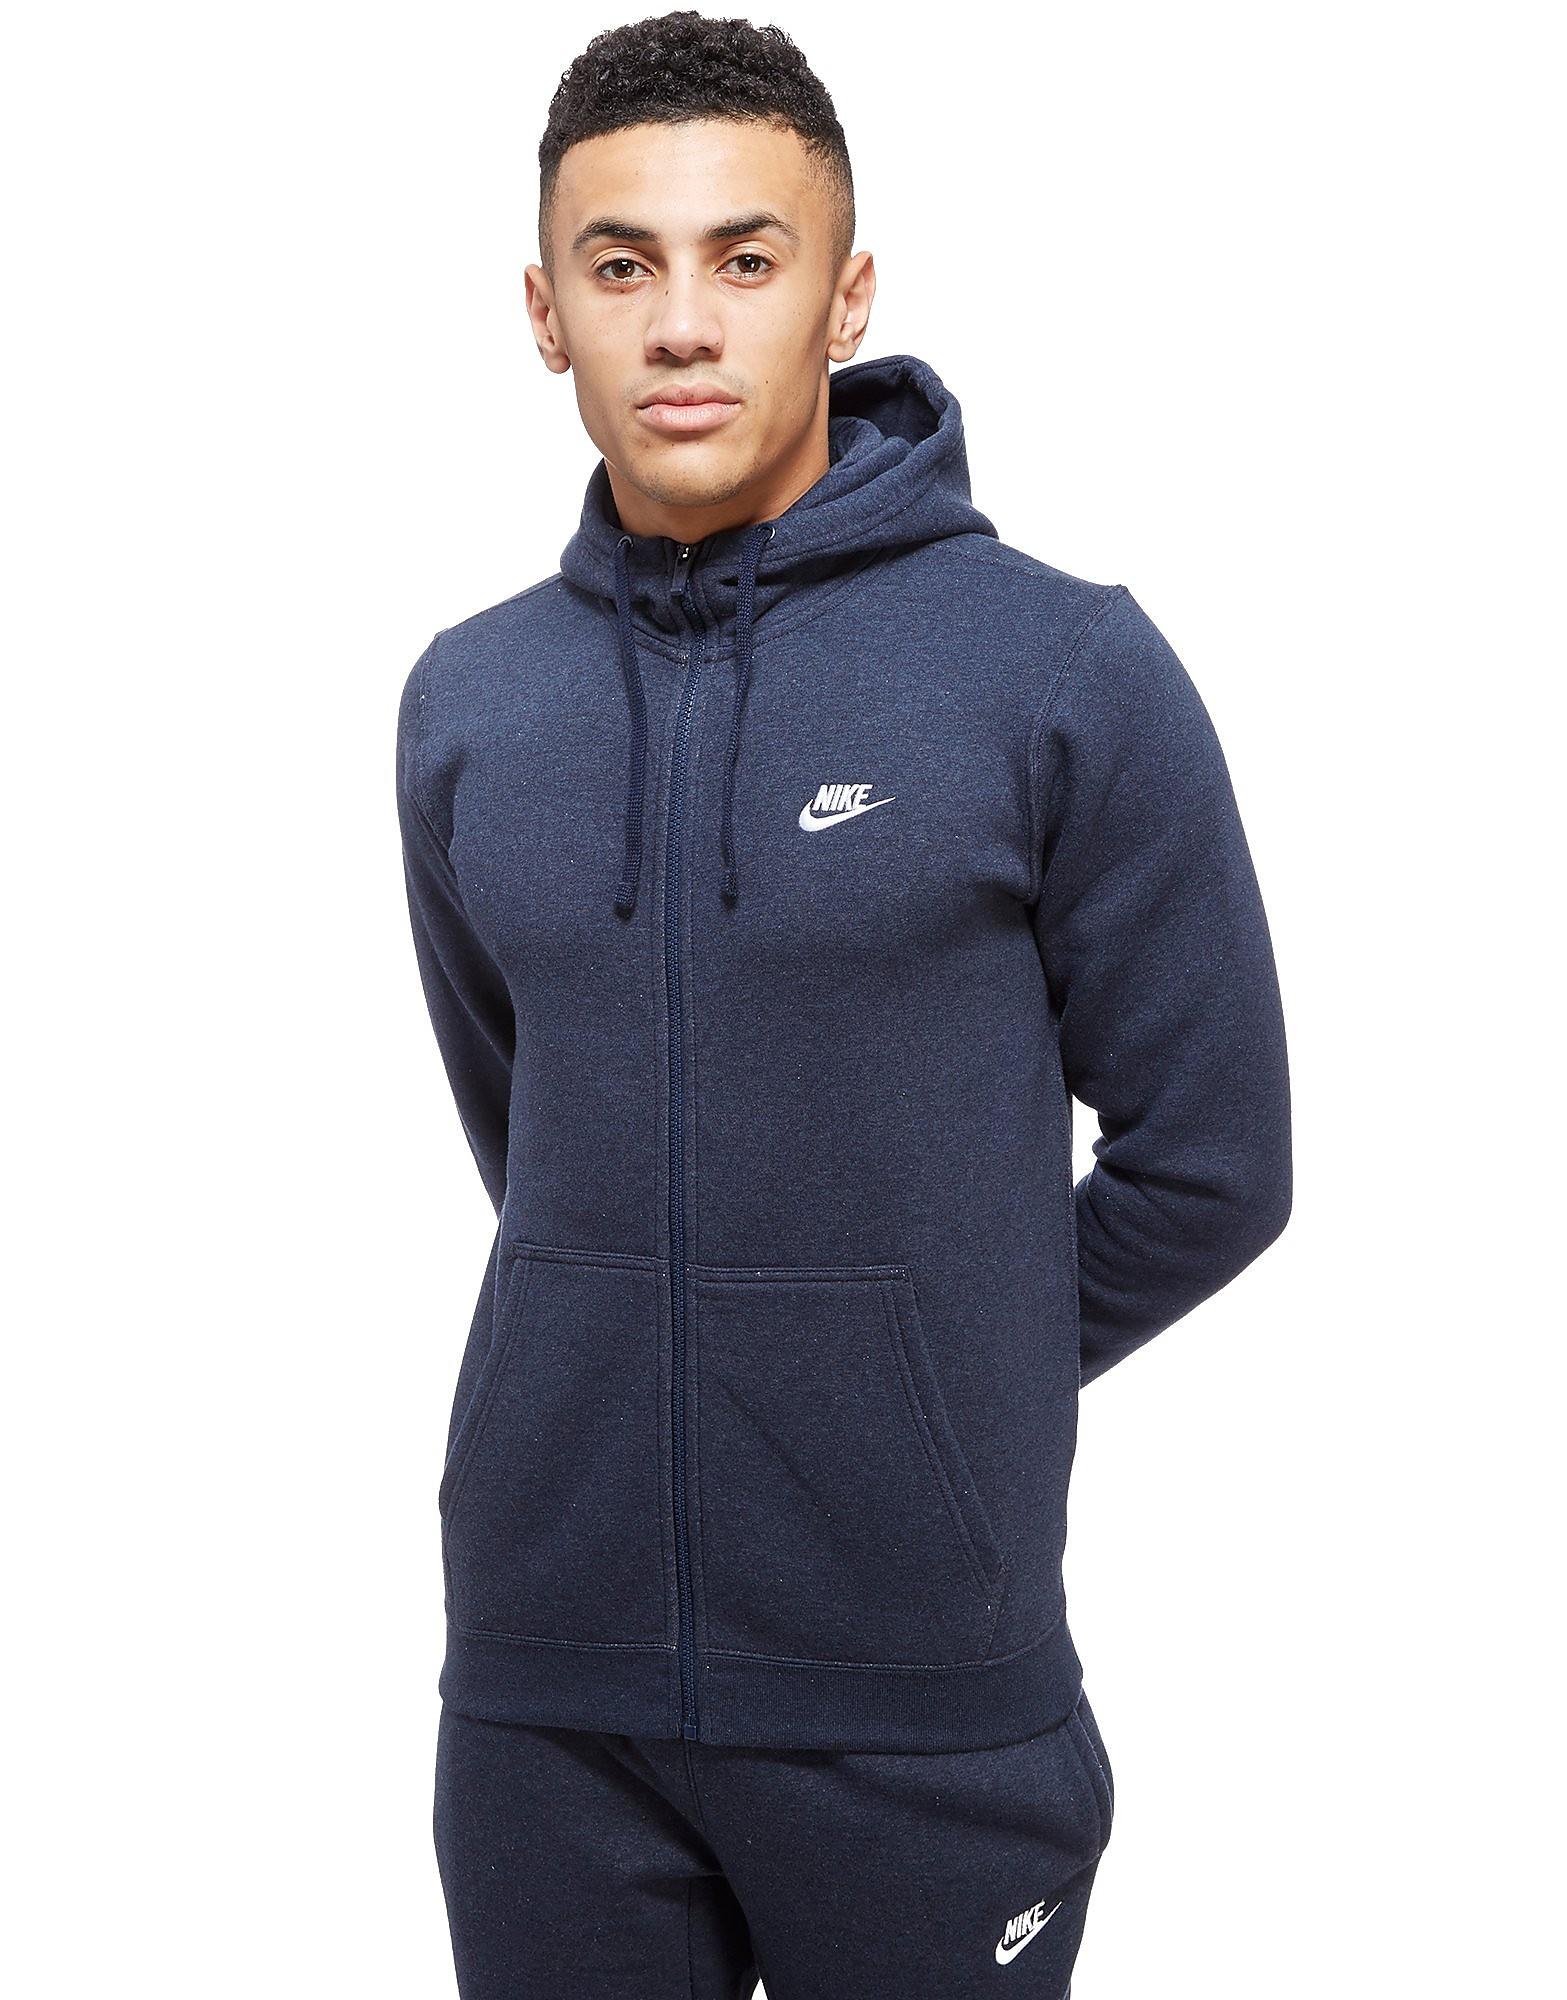 Nike Foundation Full Zip Hoody